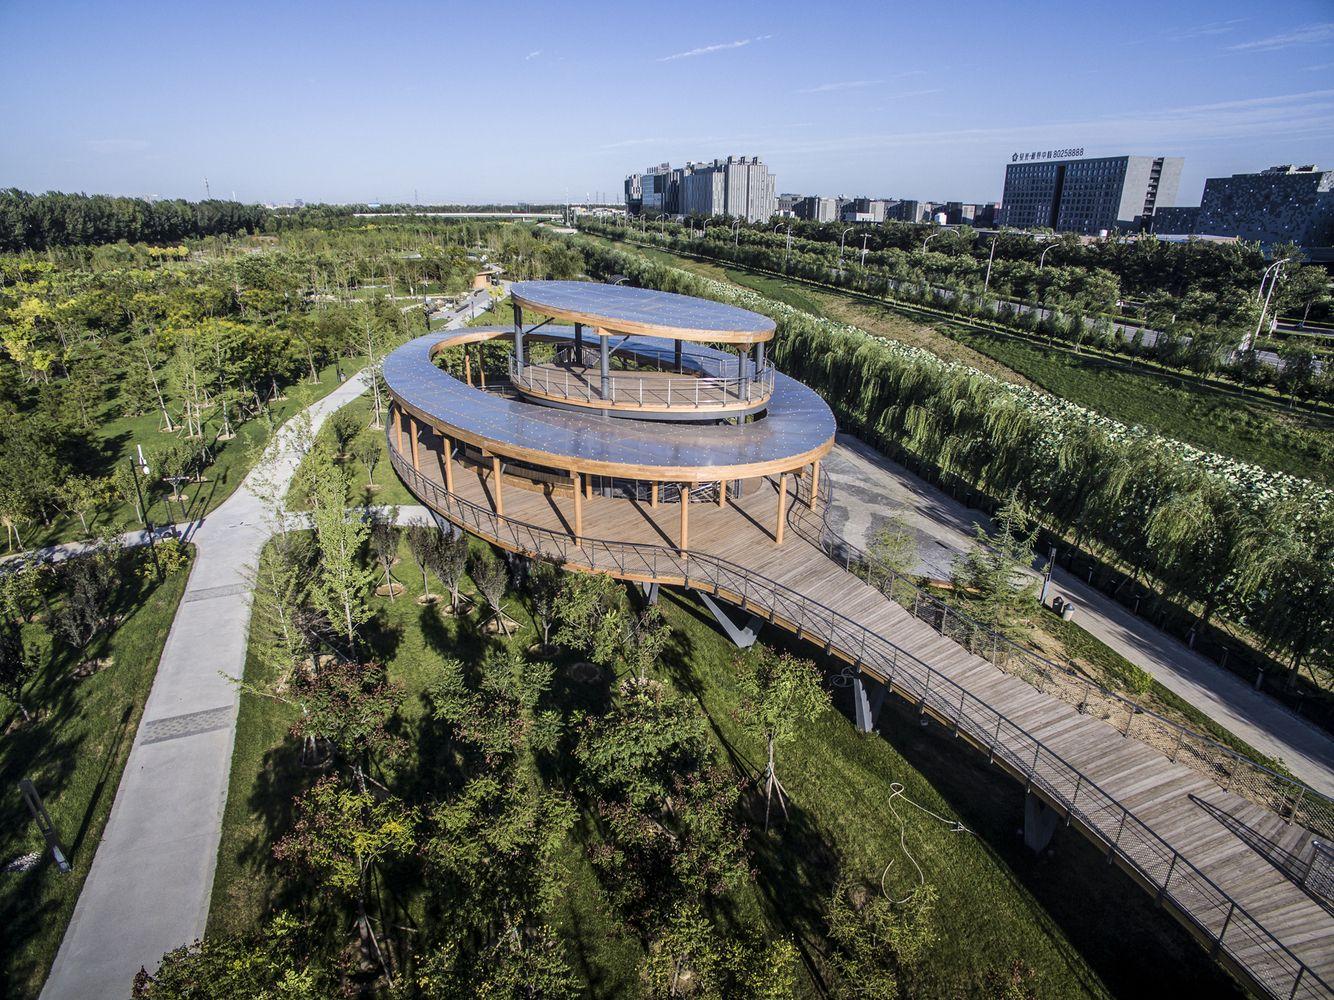 Gallery Of Beijing Daxing Park Cobblestone Design Canada 2 Design Pavillon